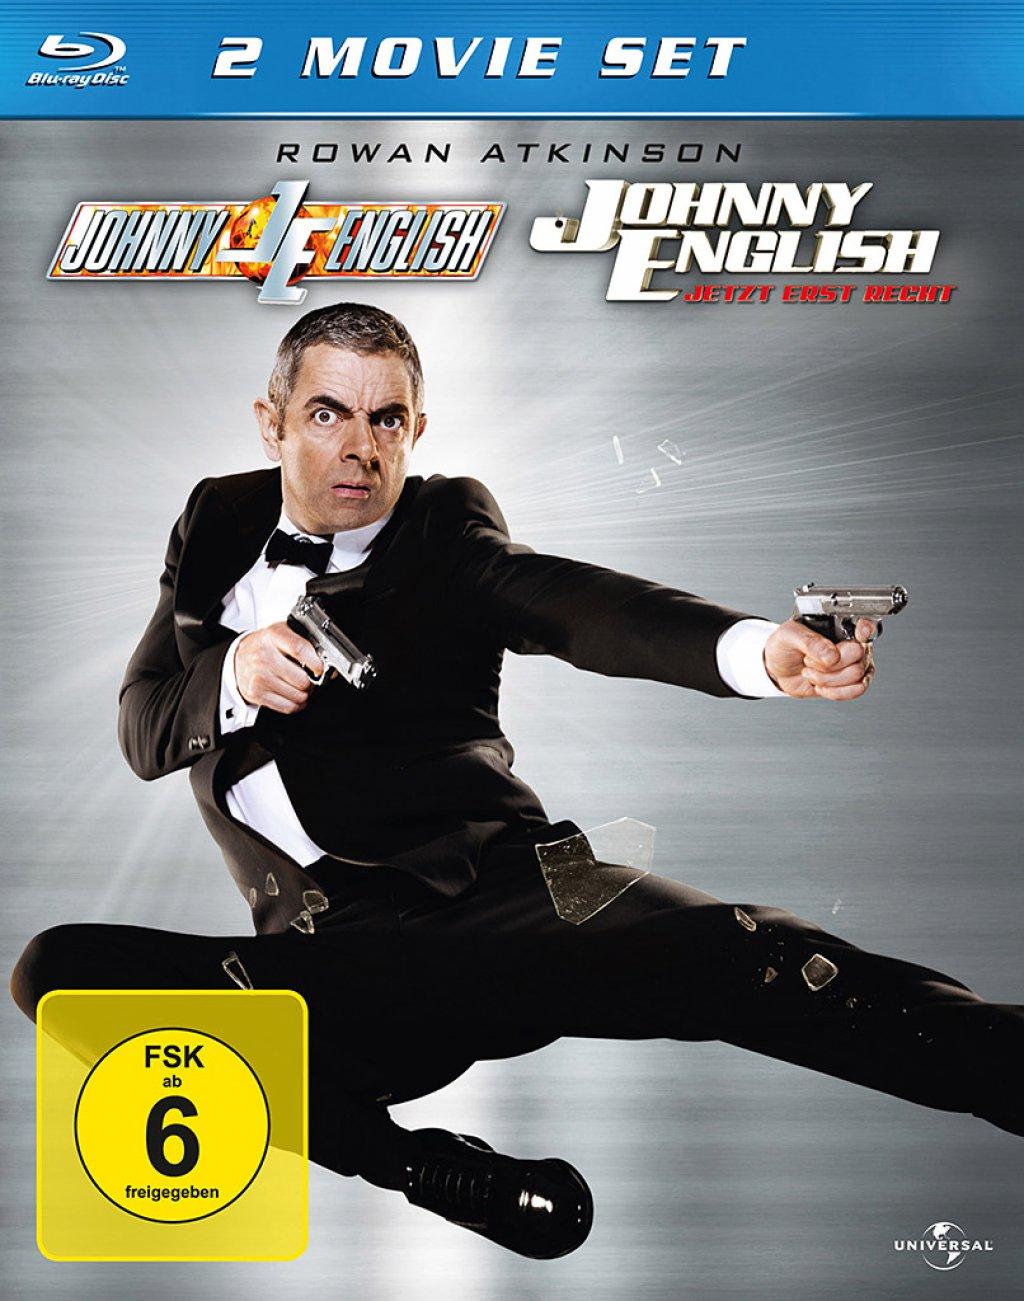 Johnny English & Johnny English - Jetzt erst Recht - 2 Movie Set (Blu-ray)